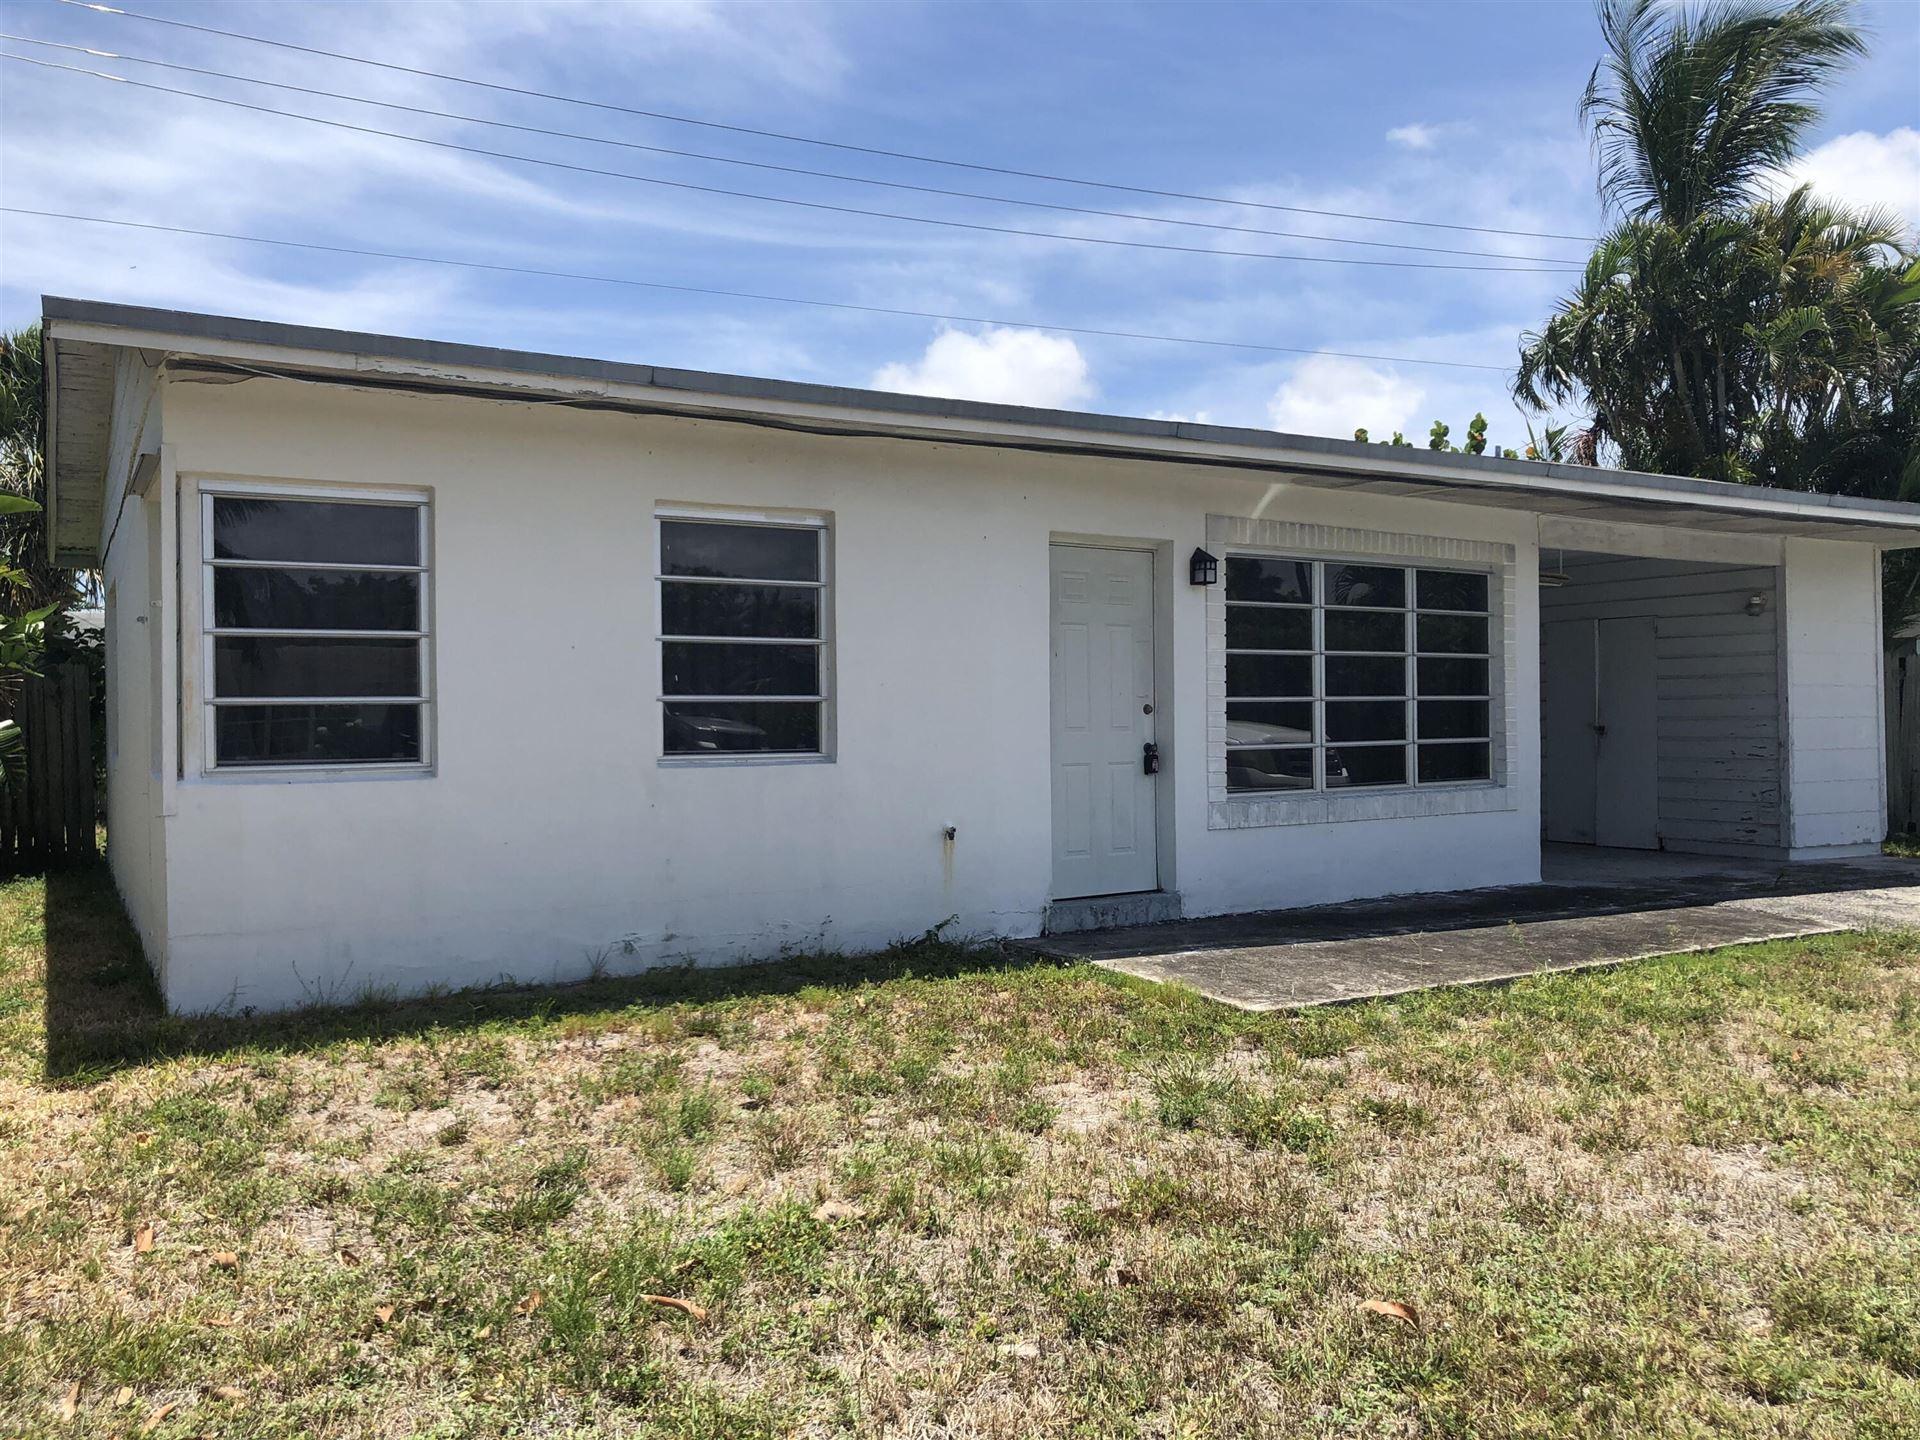 1472 NE 30th Court, Pompano Beach, FL 33064 - MLS#: RX-10721834